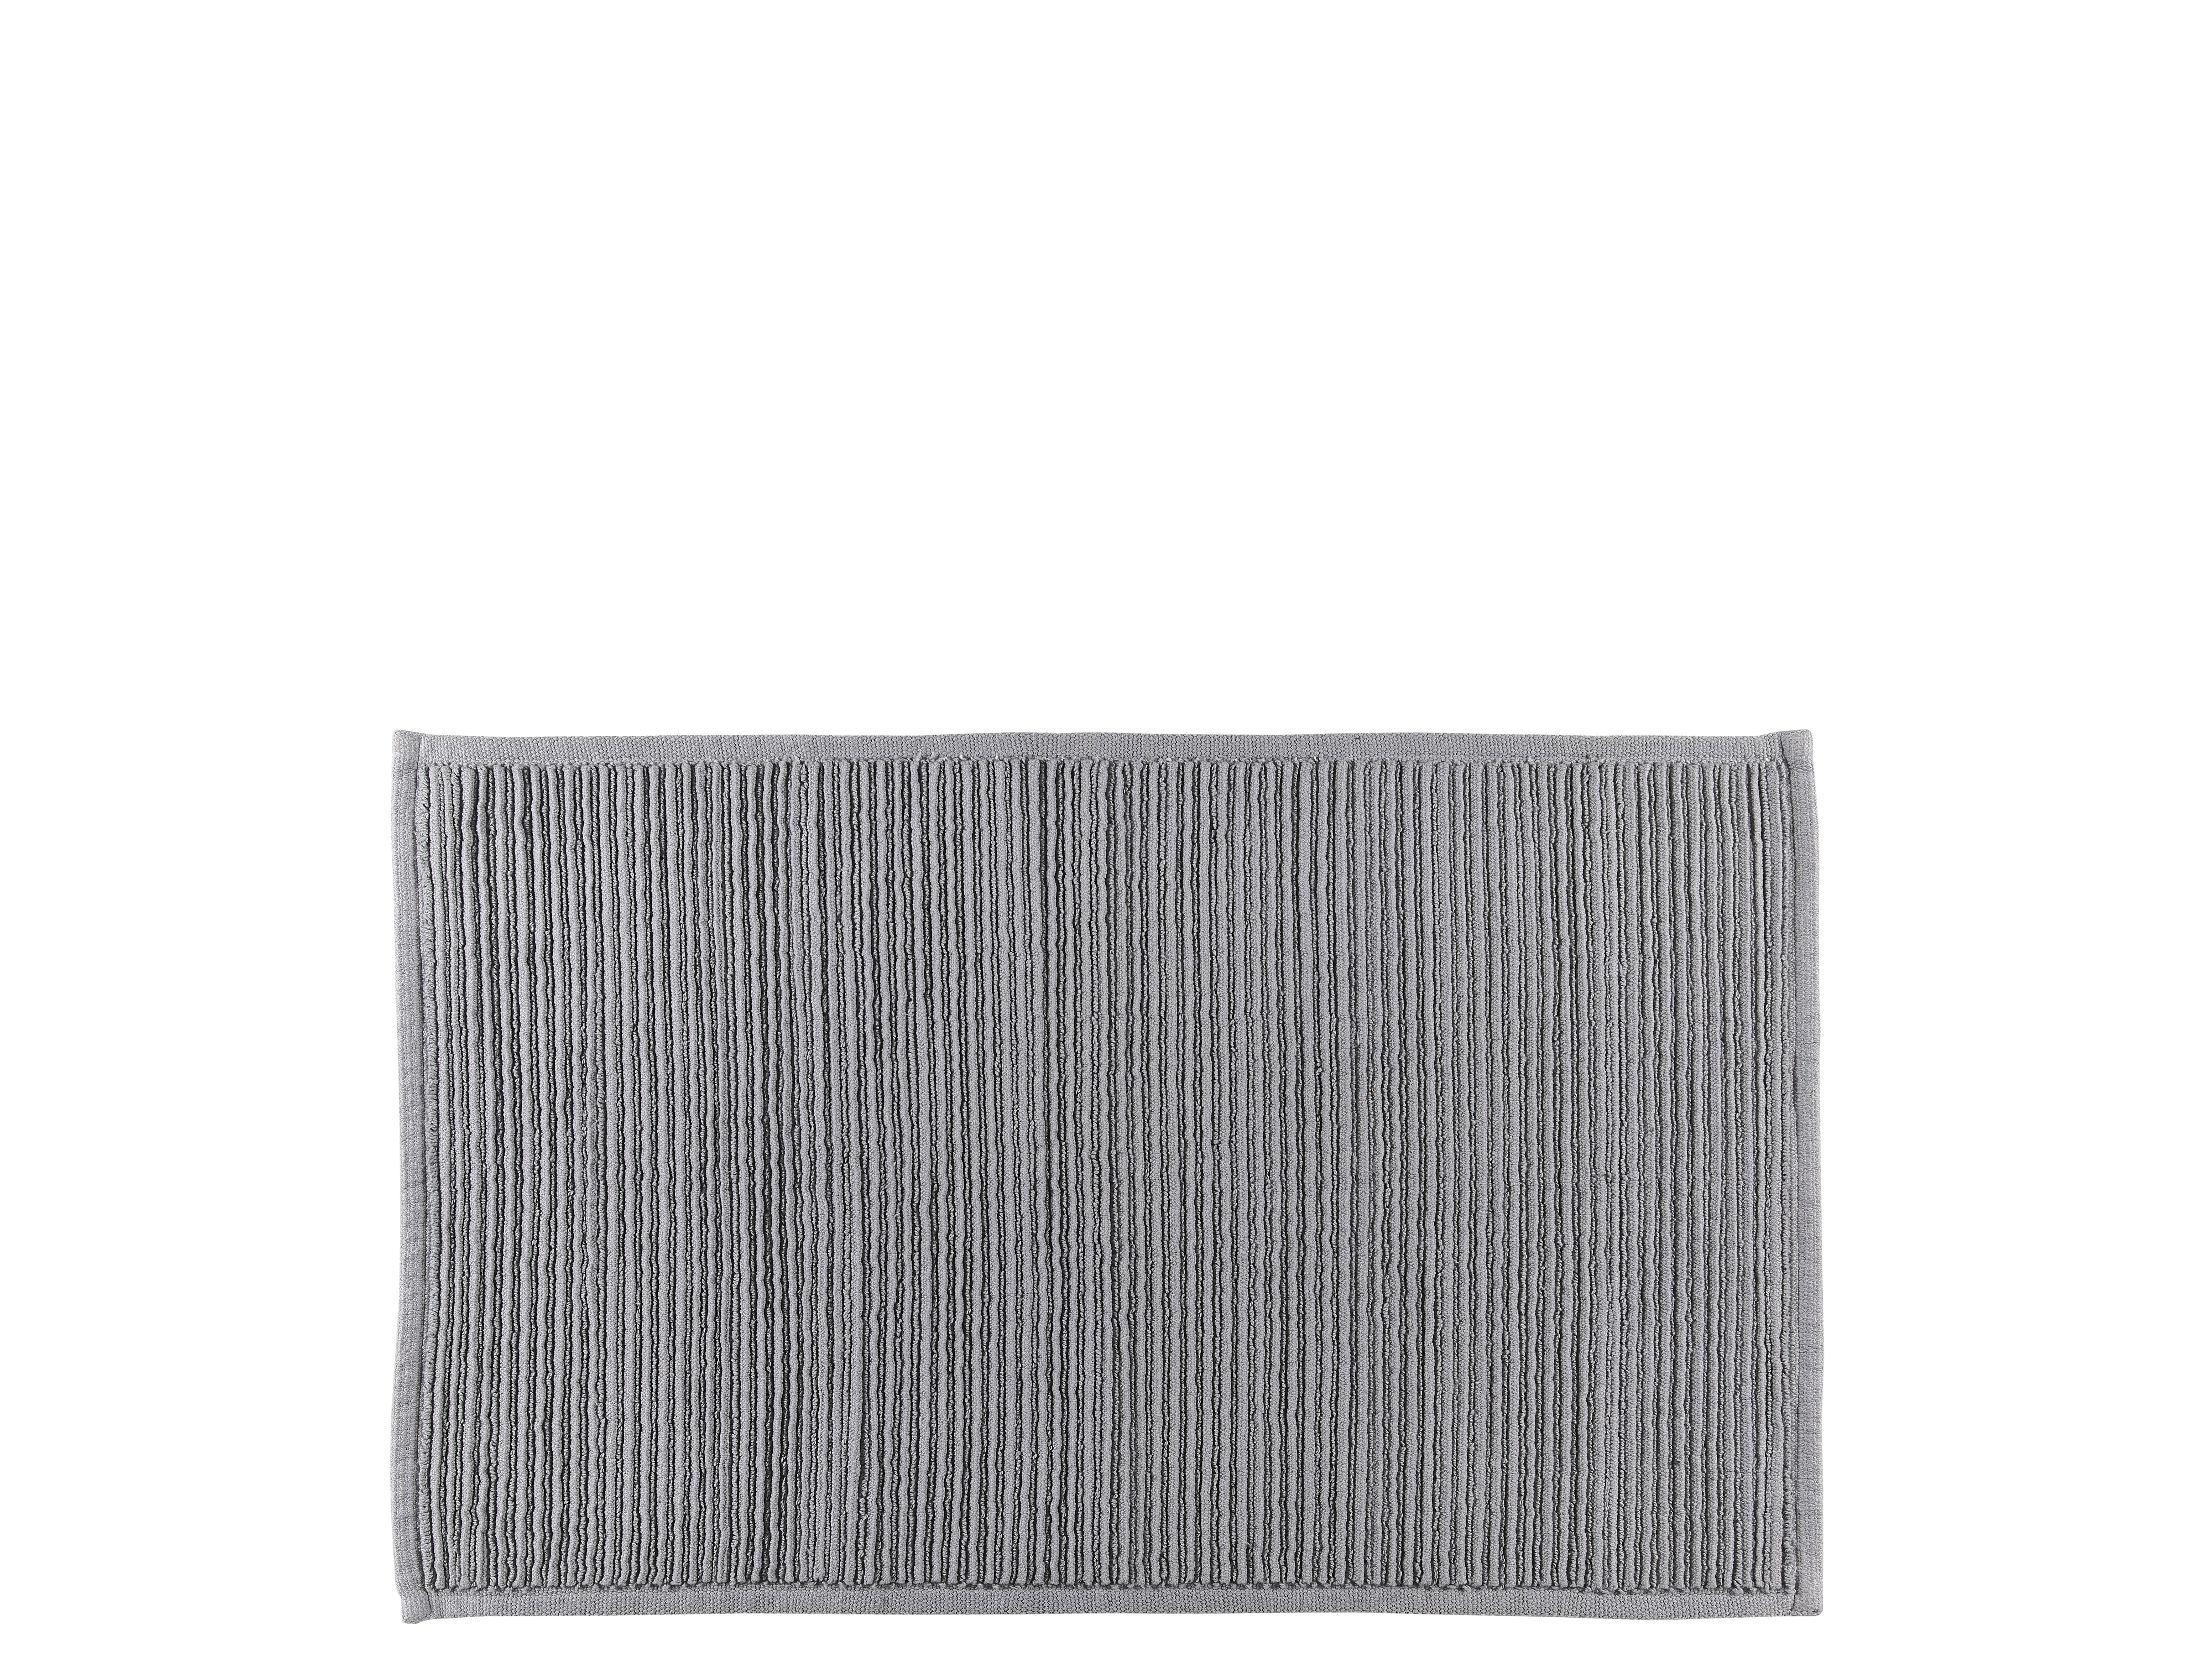 Södahl Plissé bademåtte, 50x80 cm, grey